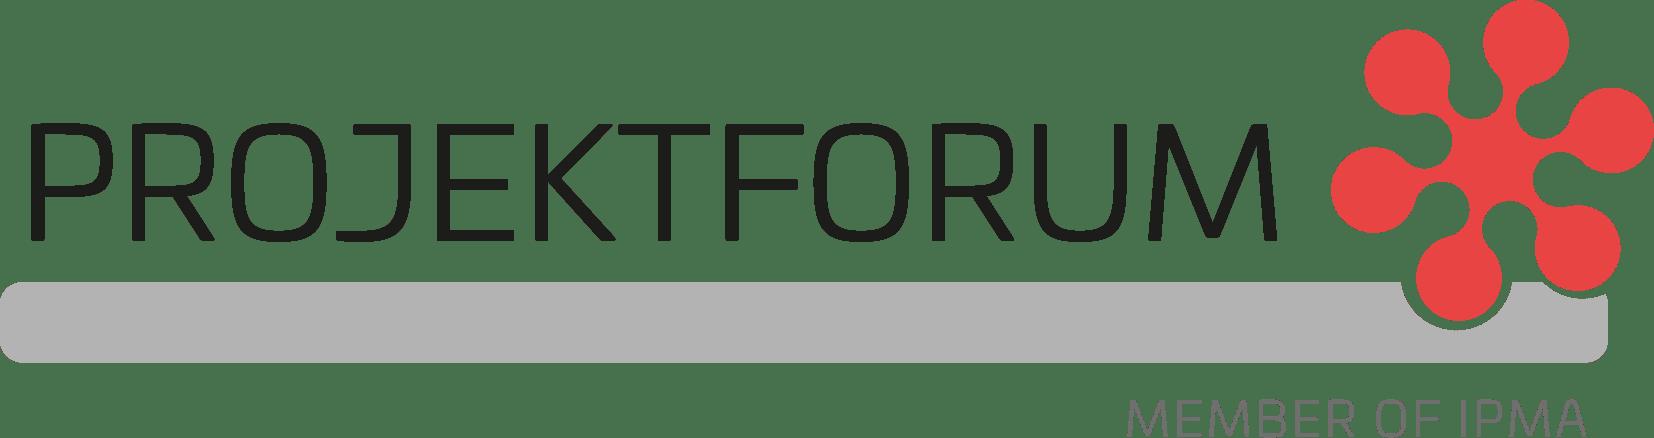 Svenskt Projektforum